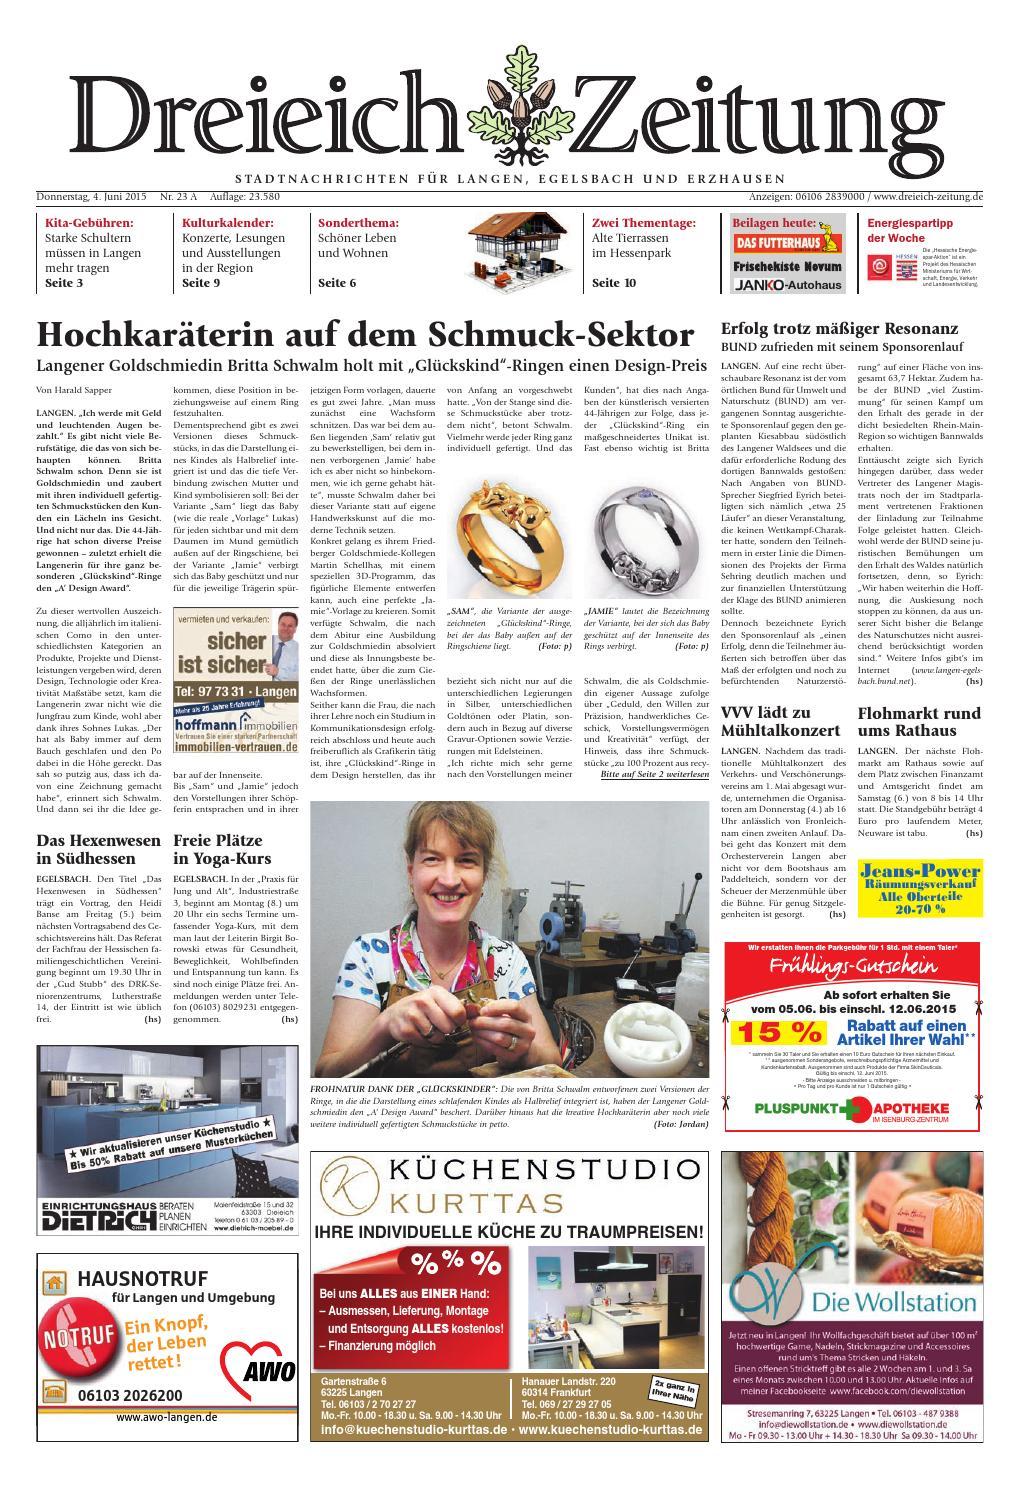 das futterhaus - friedrichsdorf friedrichsdorf